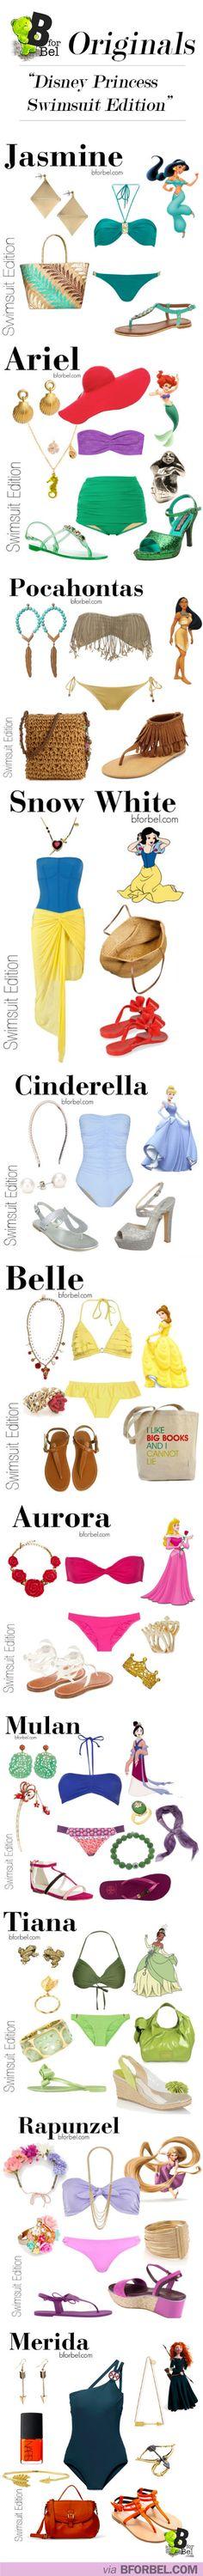 "BforBel Originals: ""Disney Princess Swimsuit Edition"" 13)I will never stop loving Disney princesses!"